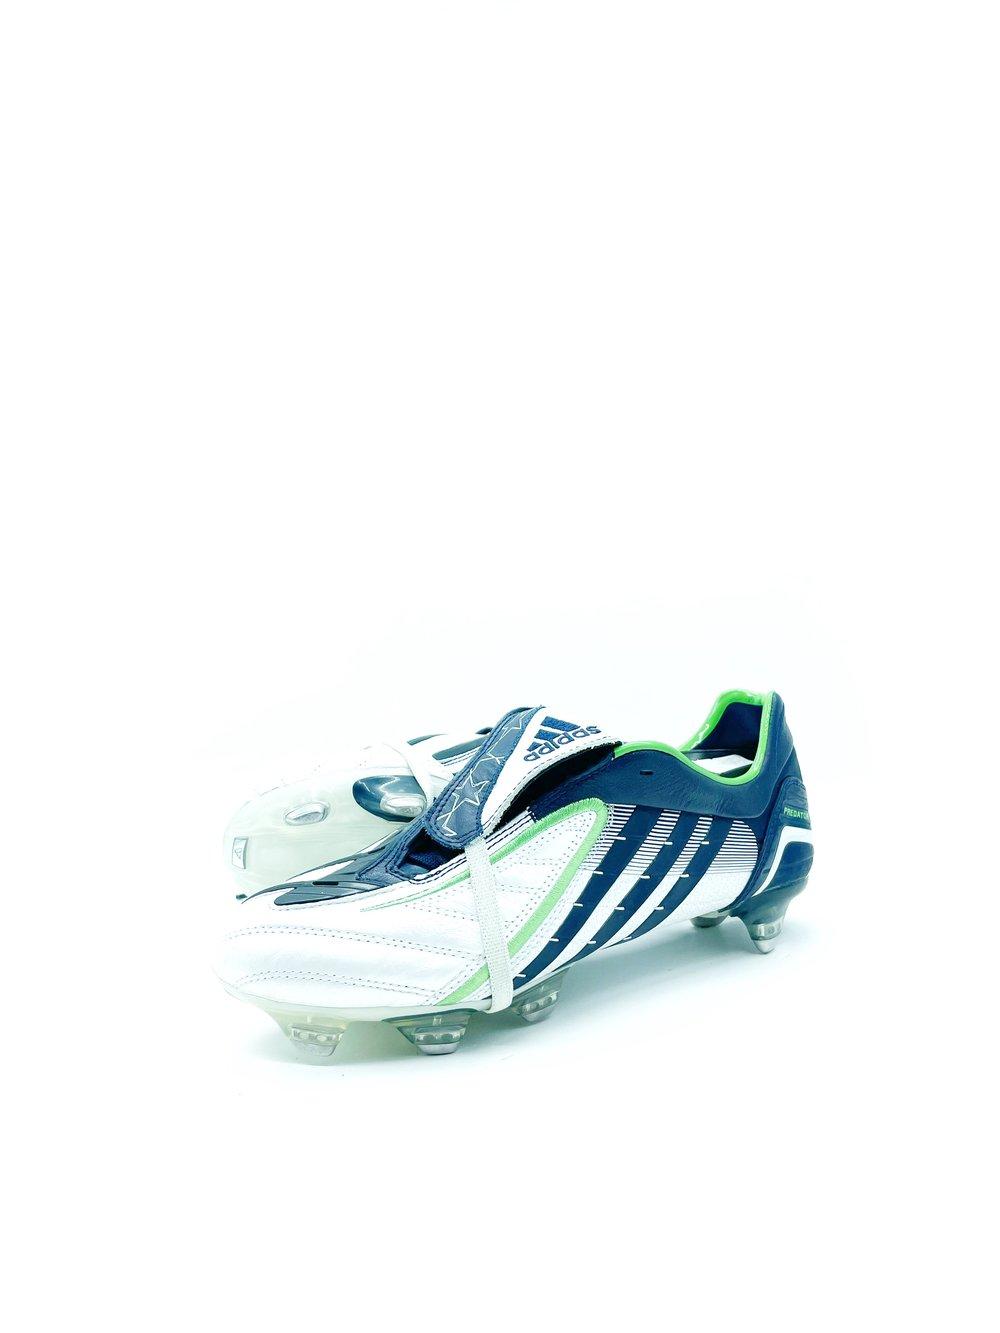 Image of Adidas predator Abs FG or SG